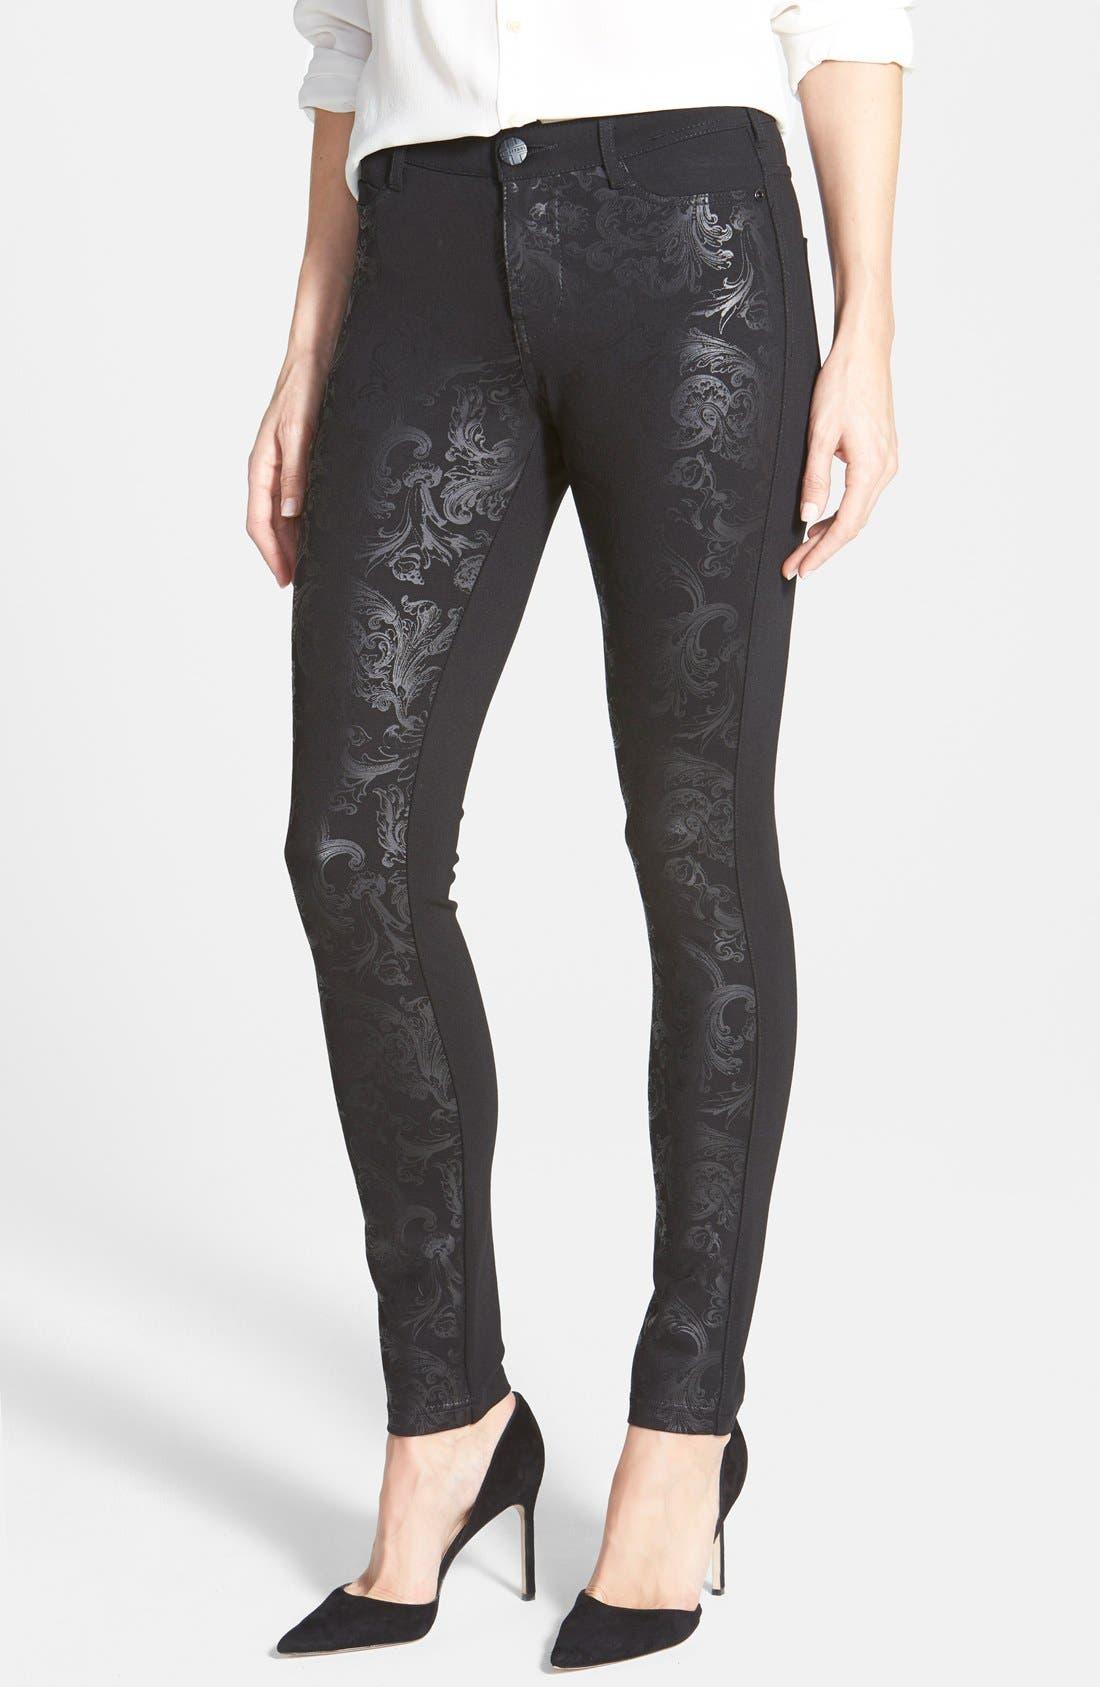 Alternate Image 1 Selected - Liverpool Jeans Company 'Madonna' Gloss Print Stretch Knit Skinny Pants